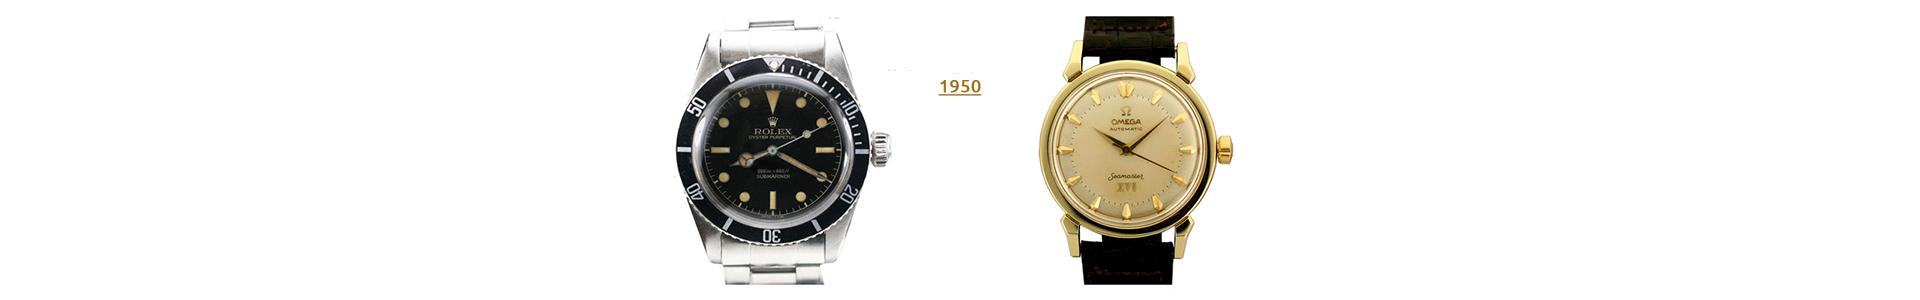 Uhren Ankauf Submariner Omega